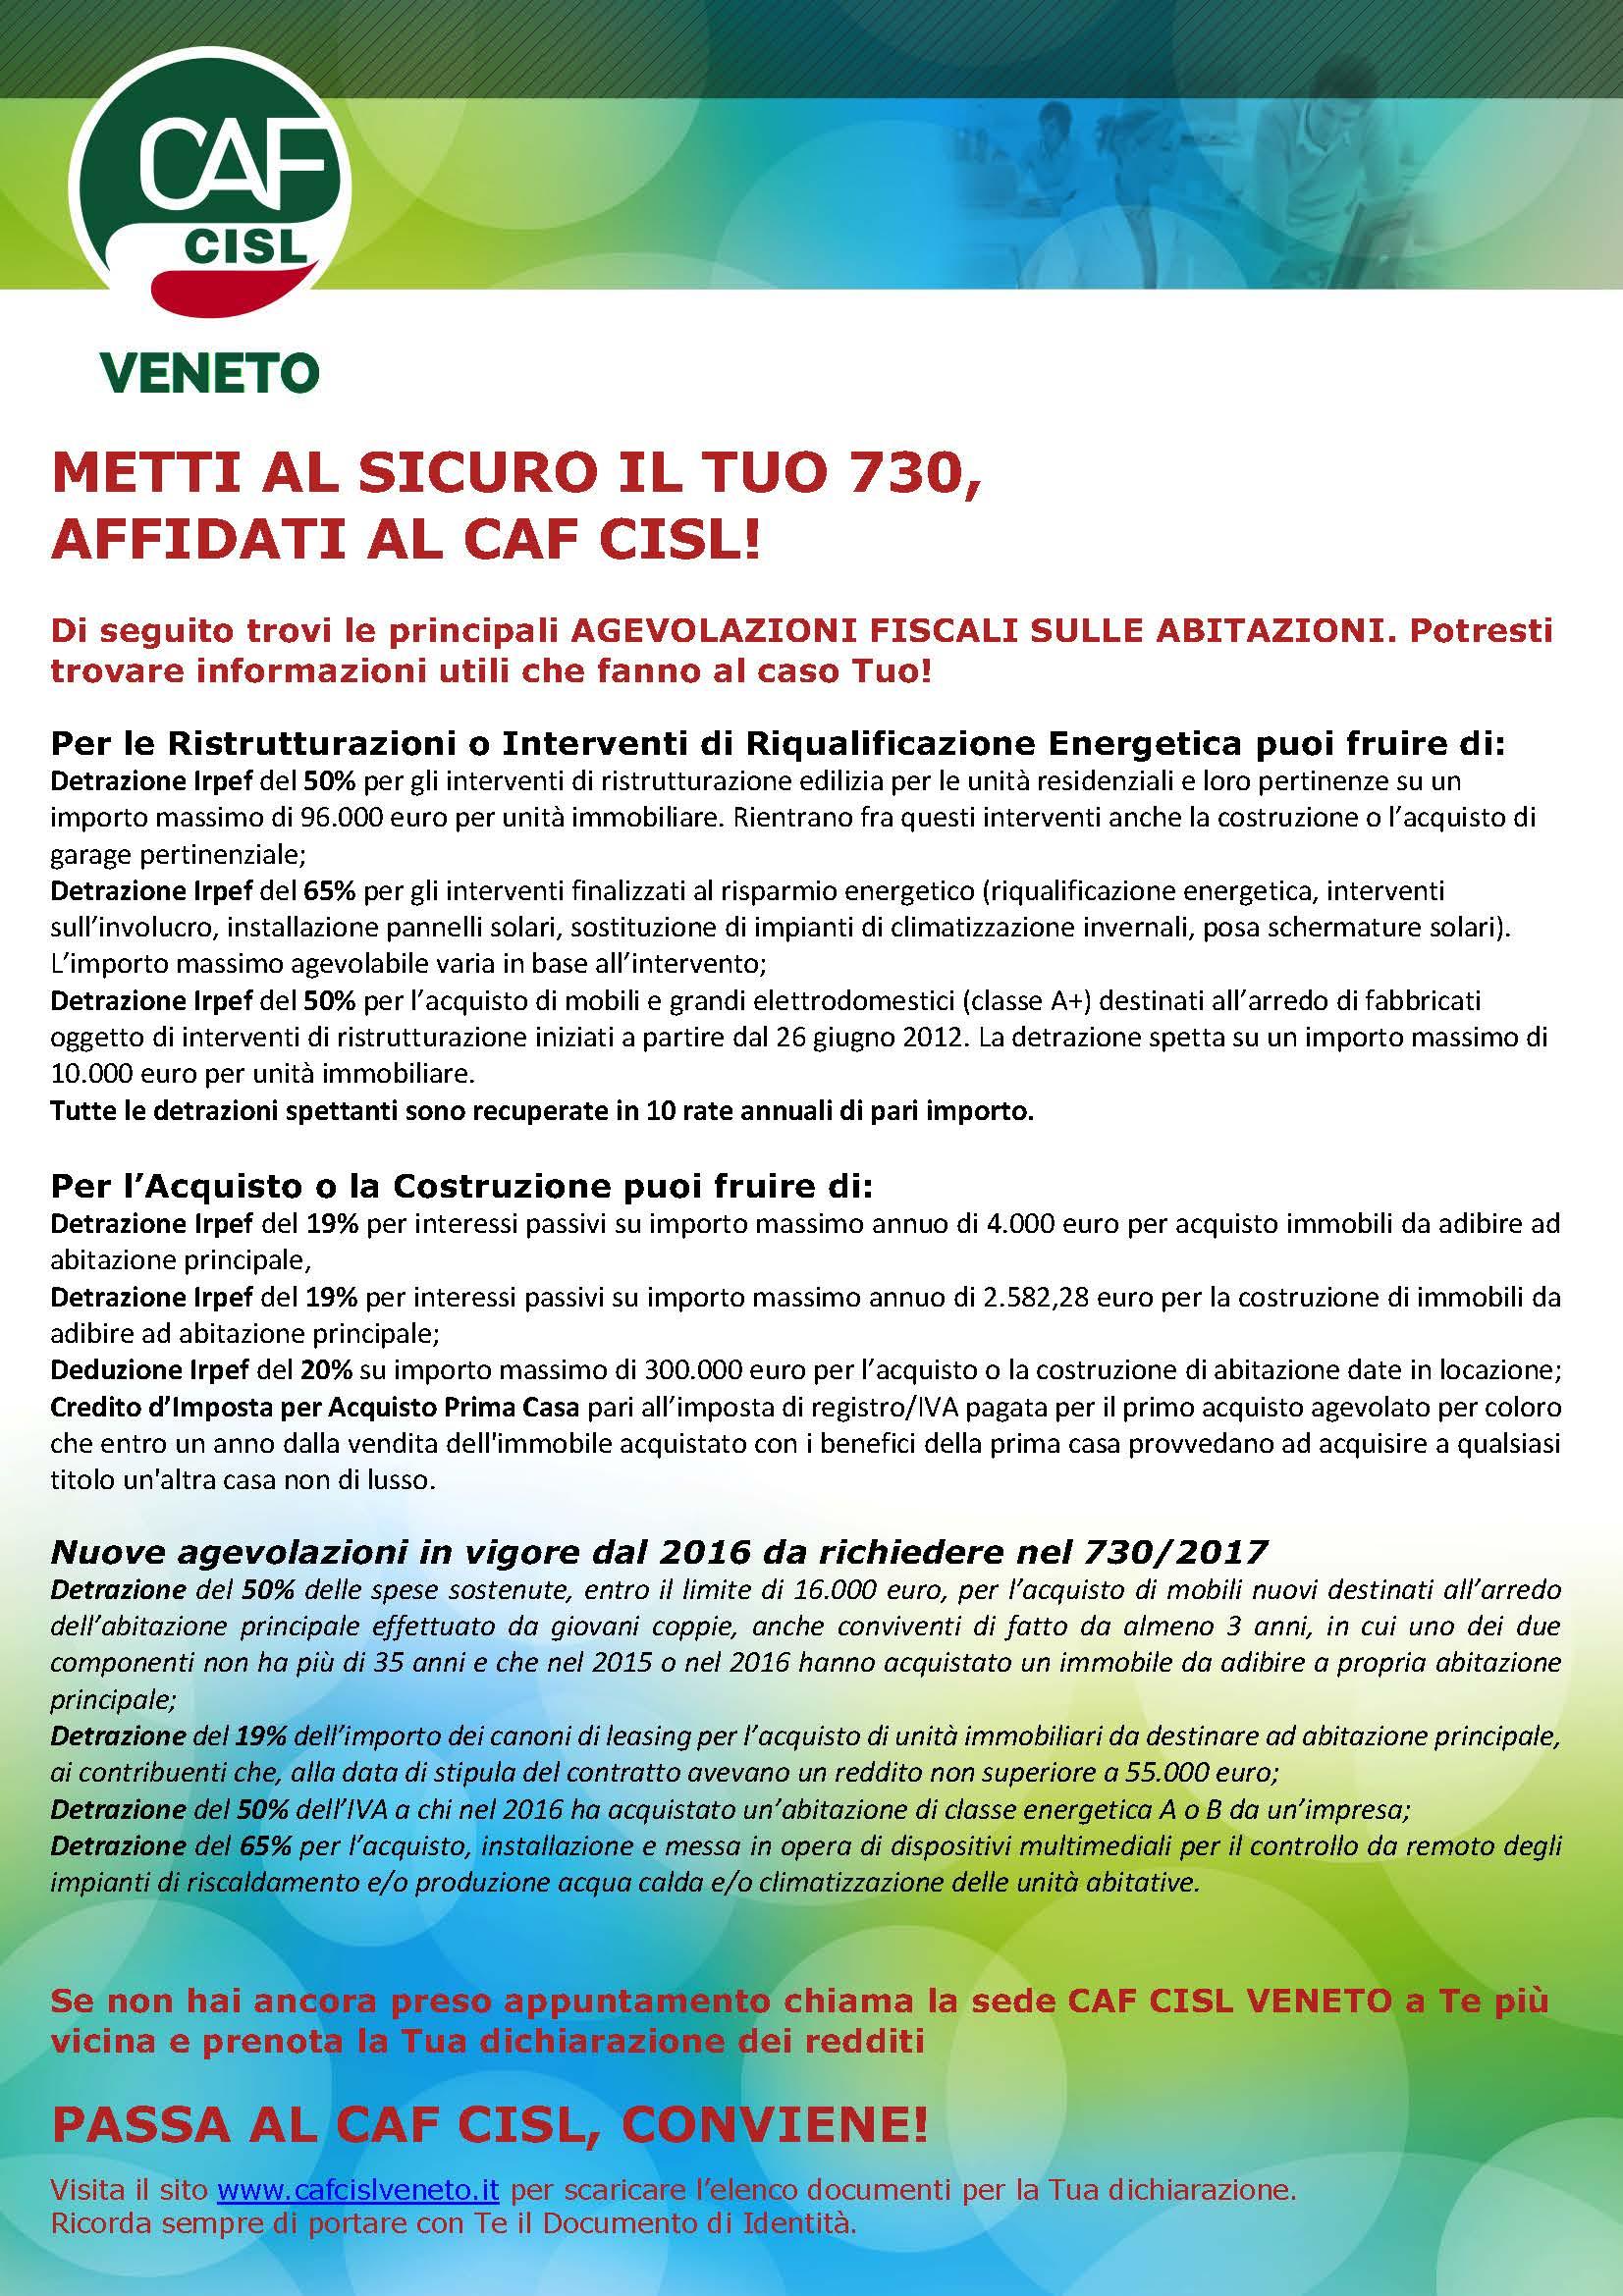 Principali novit 730 2017 cisl padova rovigo for Novita 730 2017